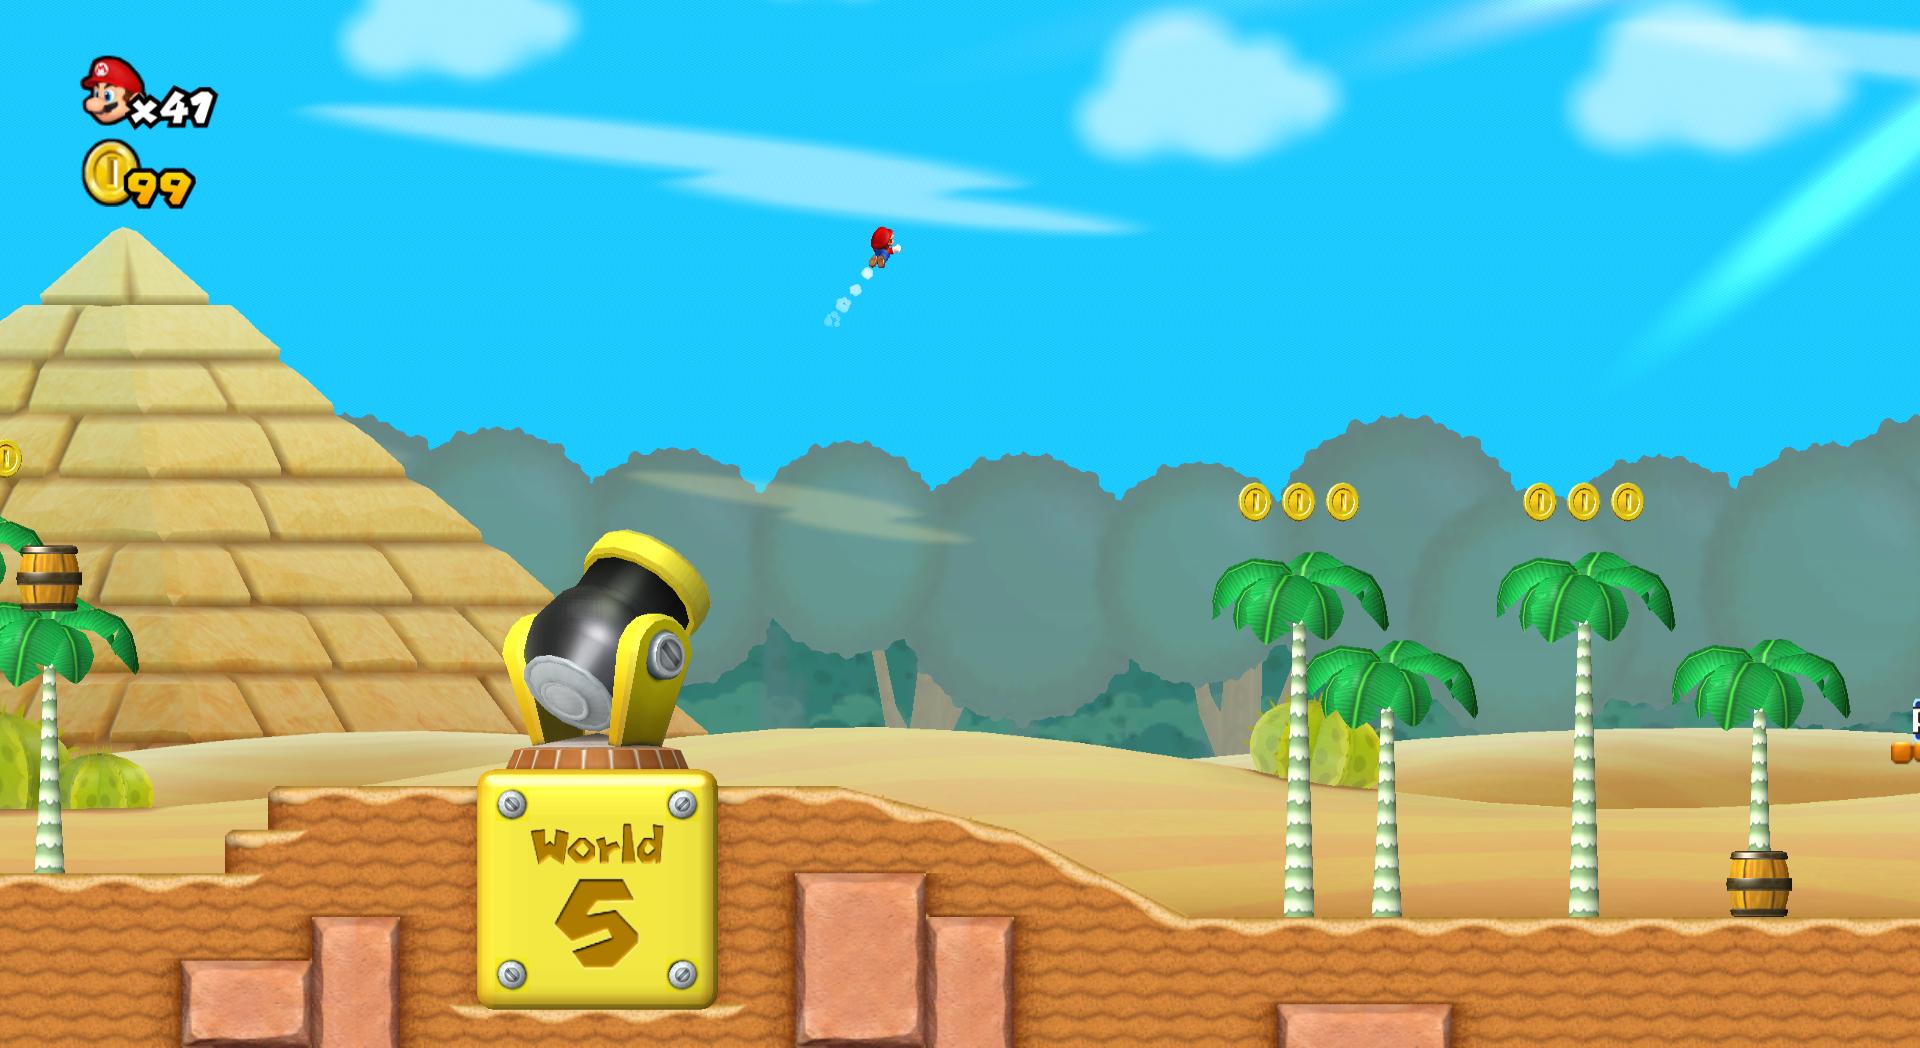 World 2 Cannon Another Super Mario Bros Wii Newer Super Mario